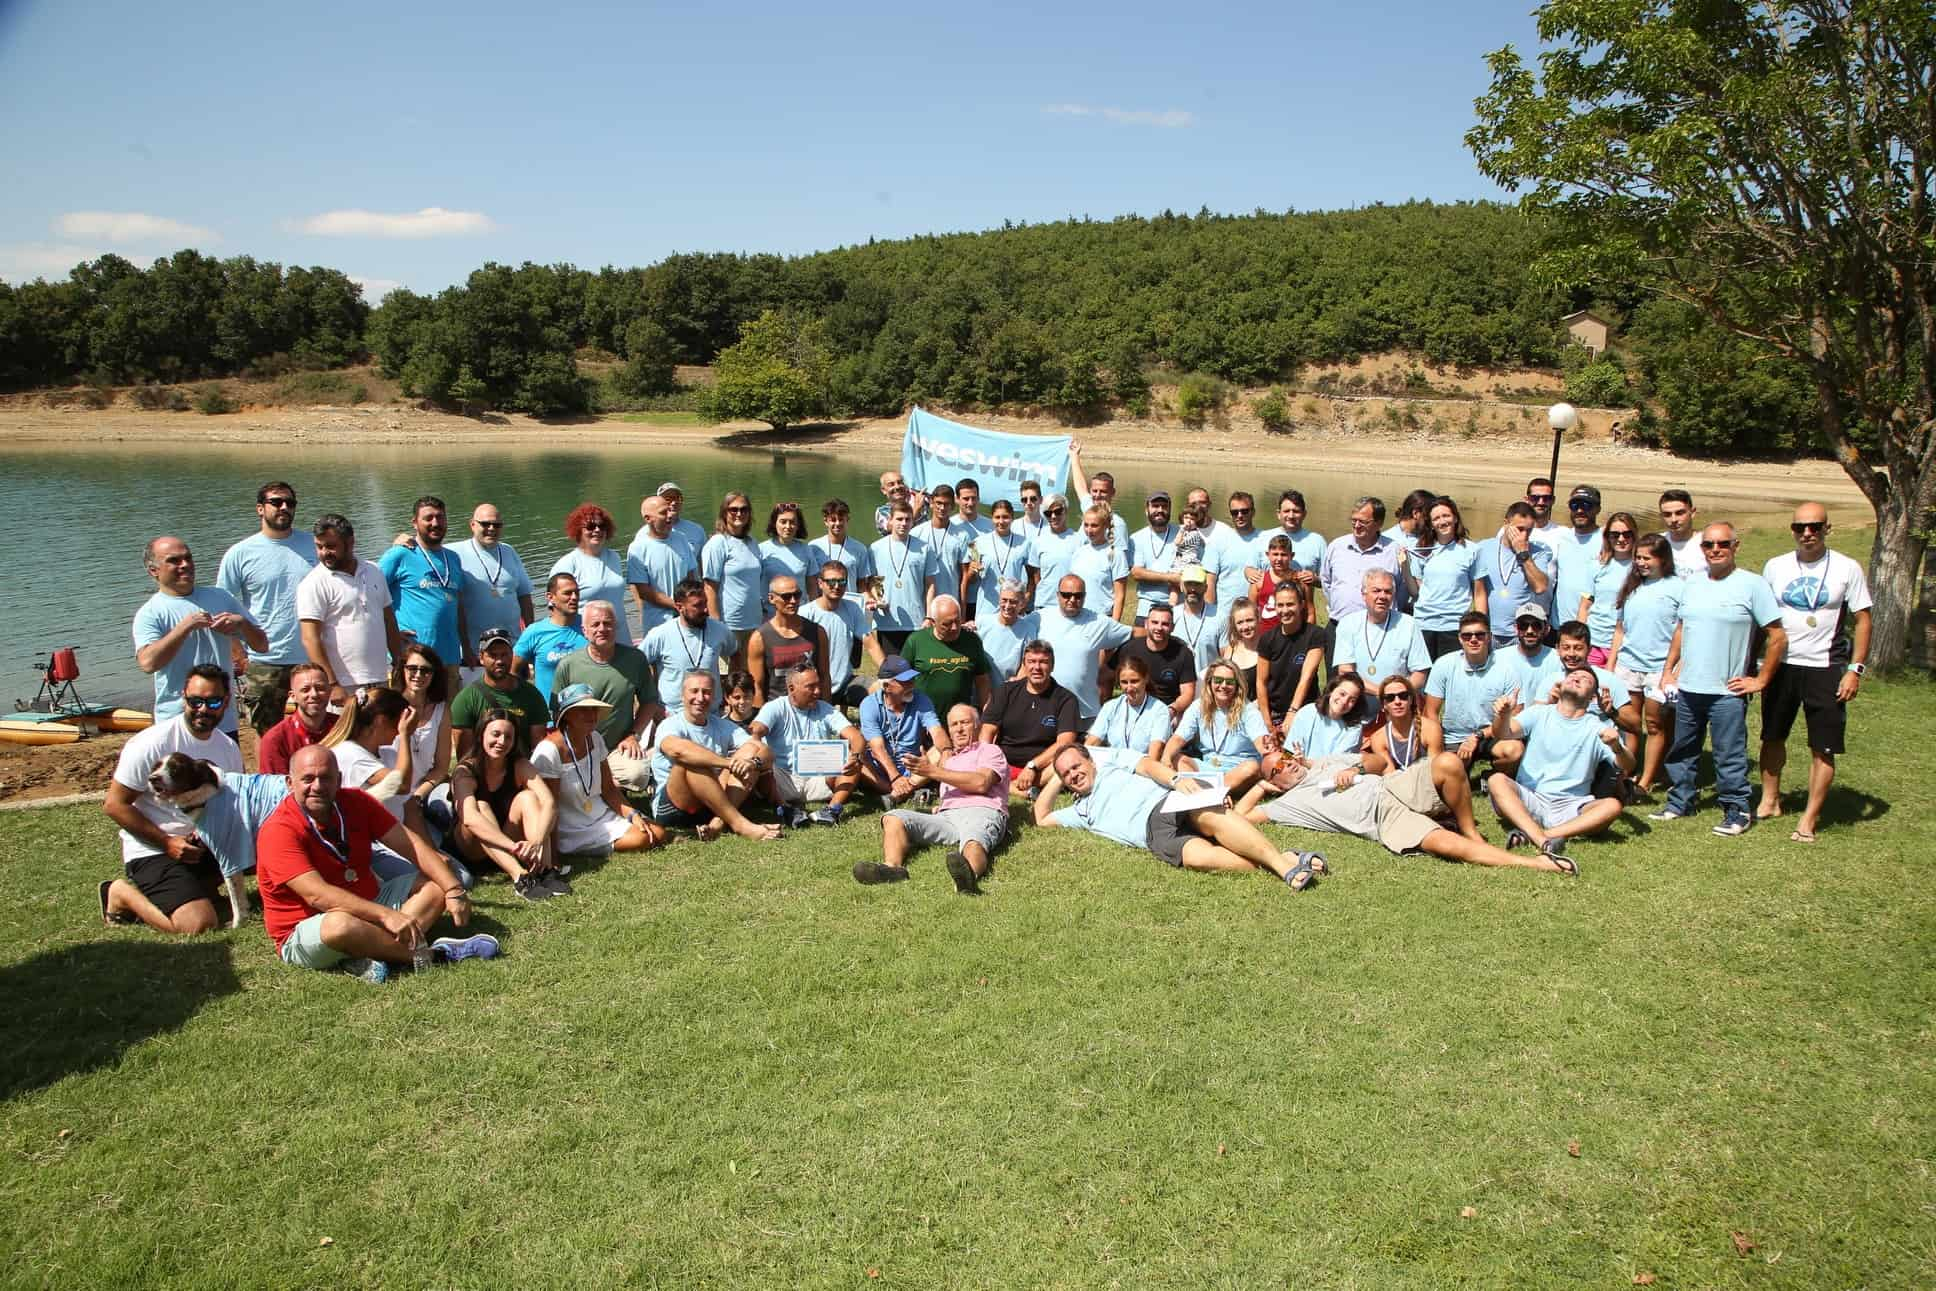 Weswim Unspoiled Λίμνη Πλαστήρα 1&2 Αυγούστου